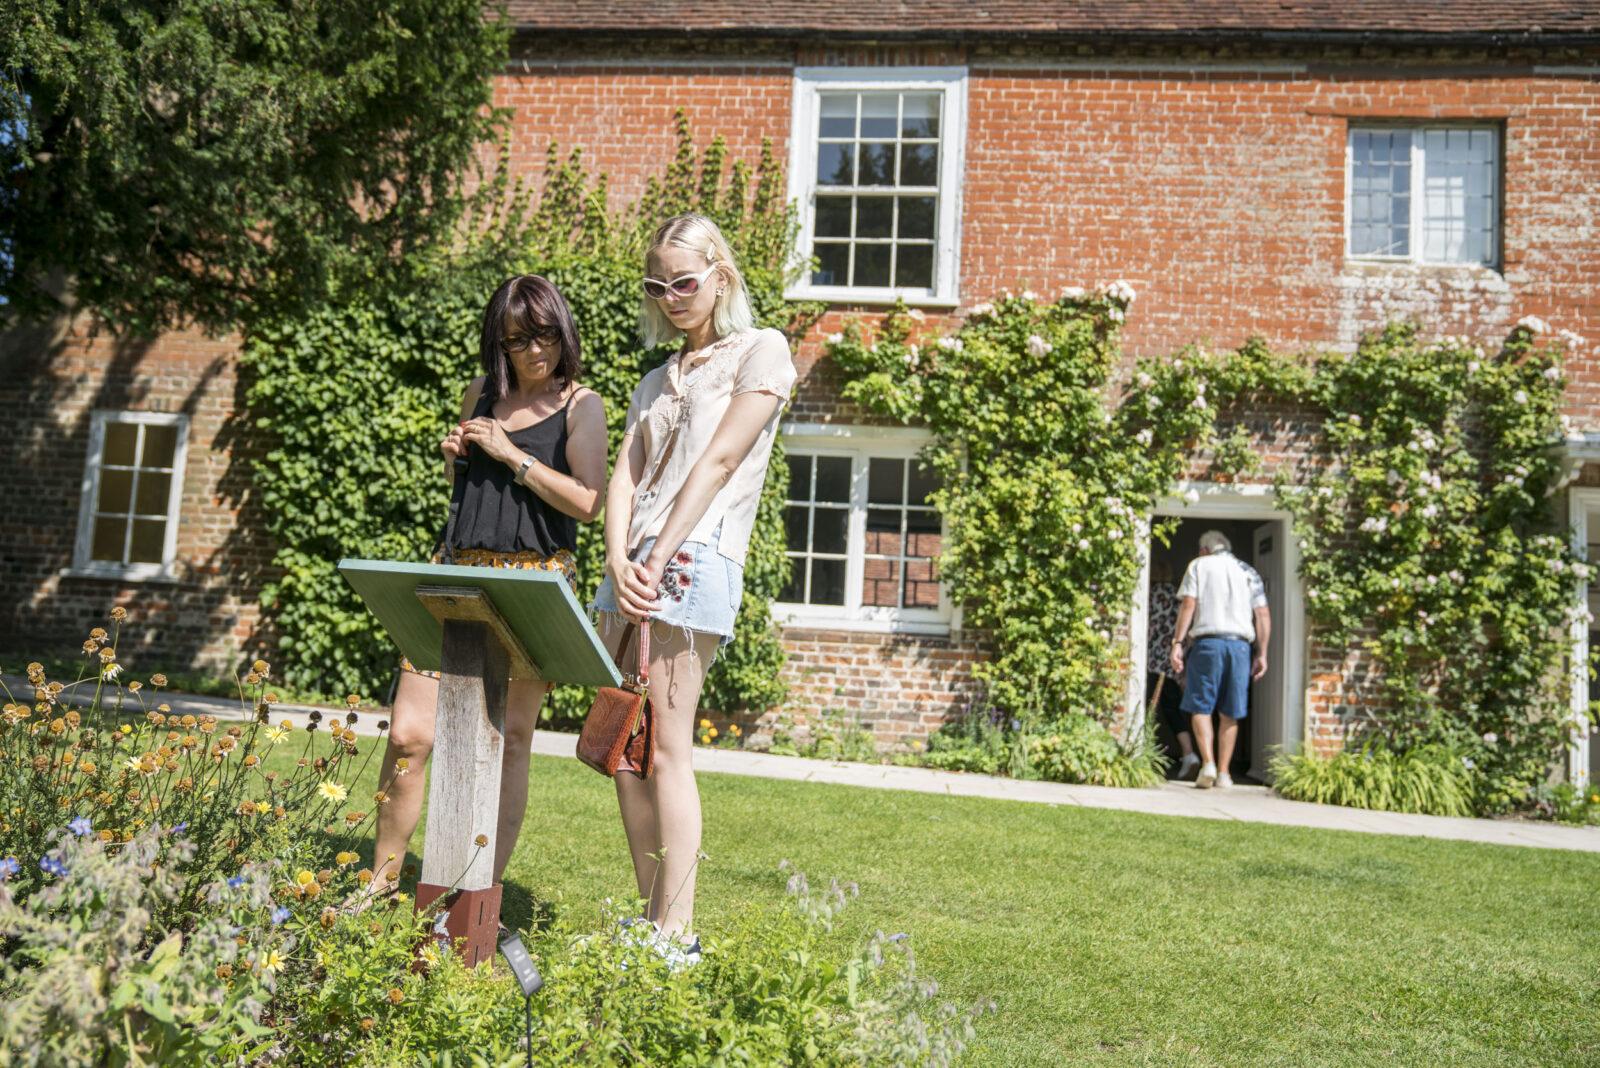 Visitors at Jane Austen's House, Hampshire